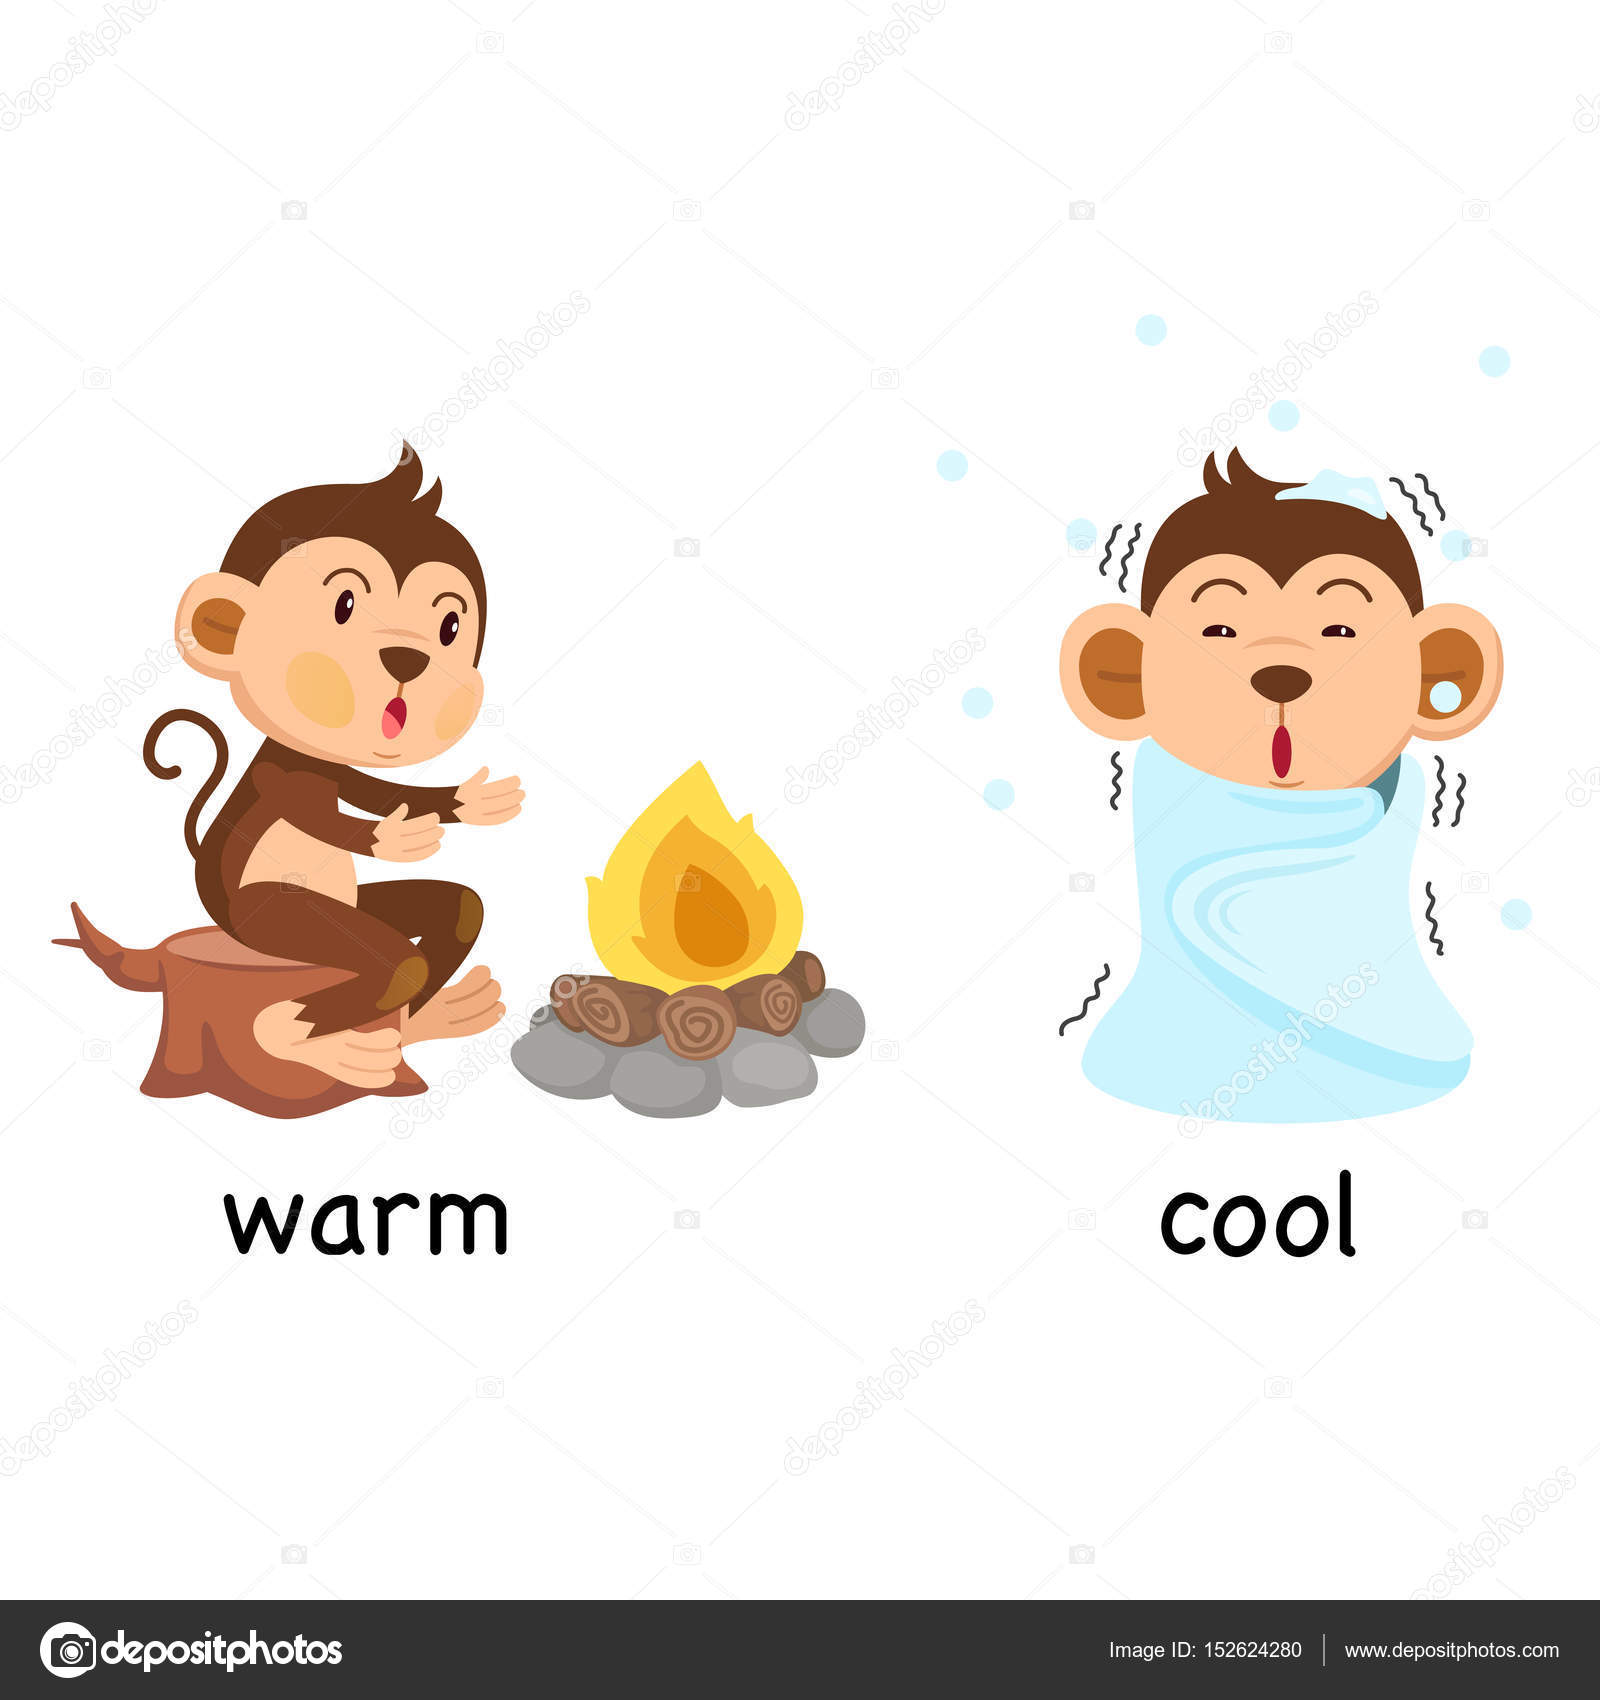 Clipart: cool temperature.